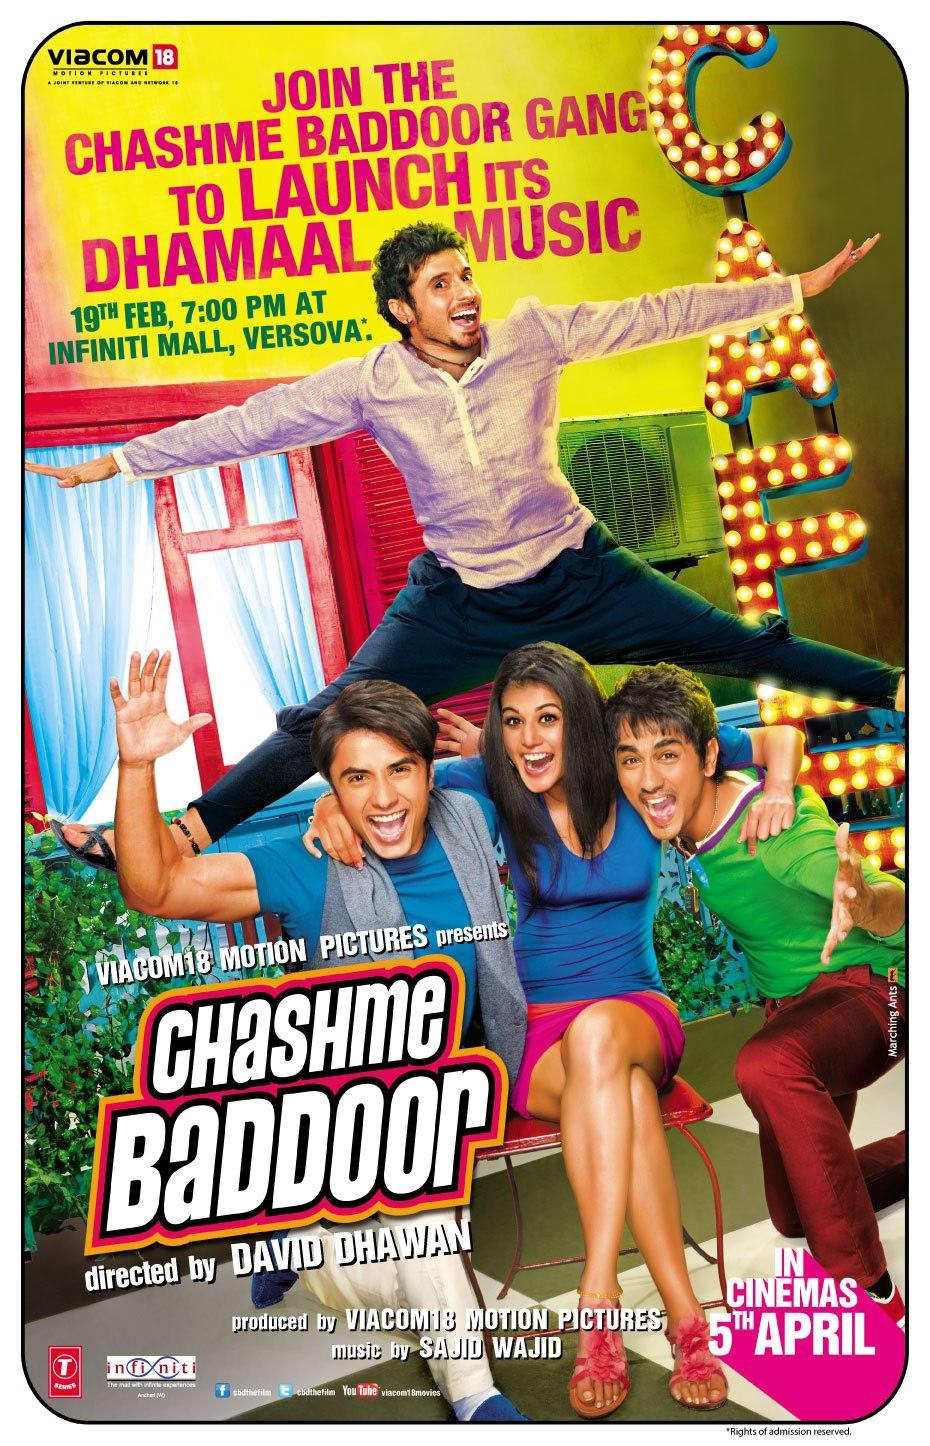 Chashme Baddoor - Movie Poster #3 (Original)